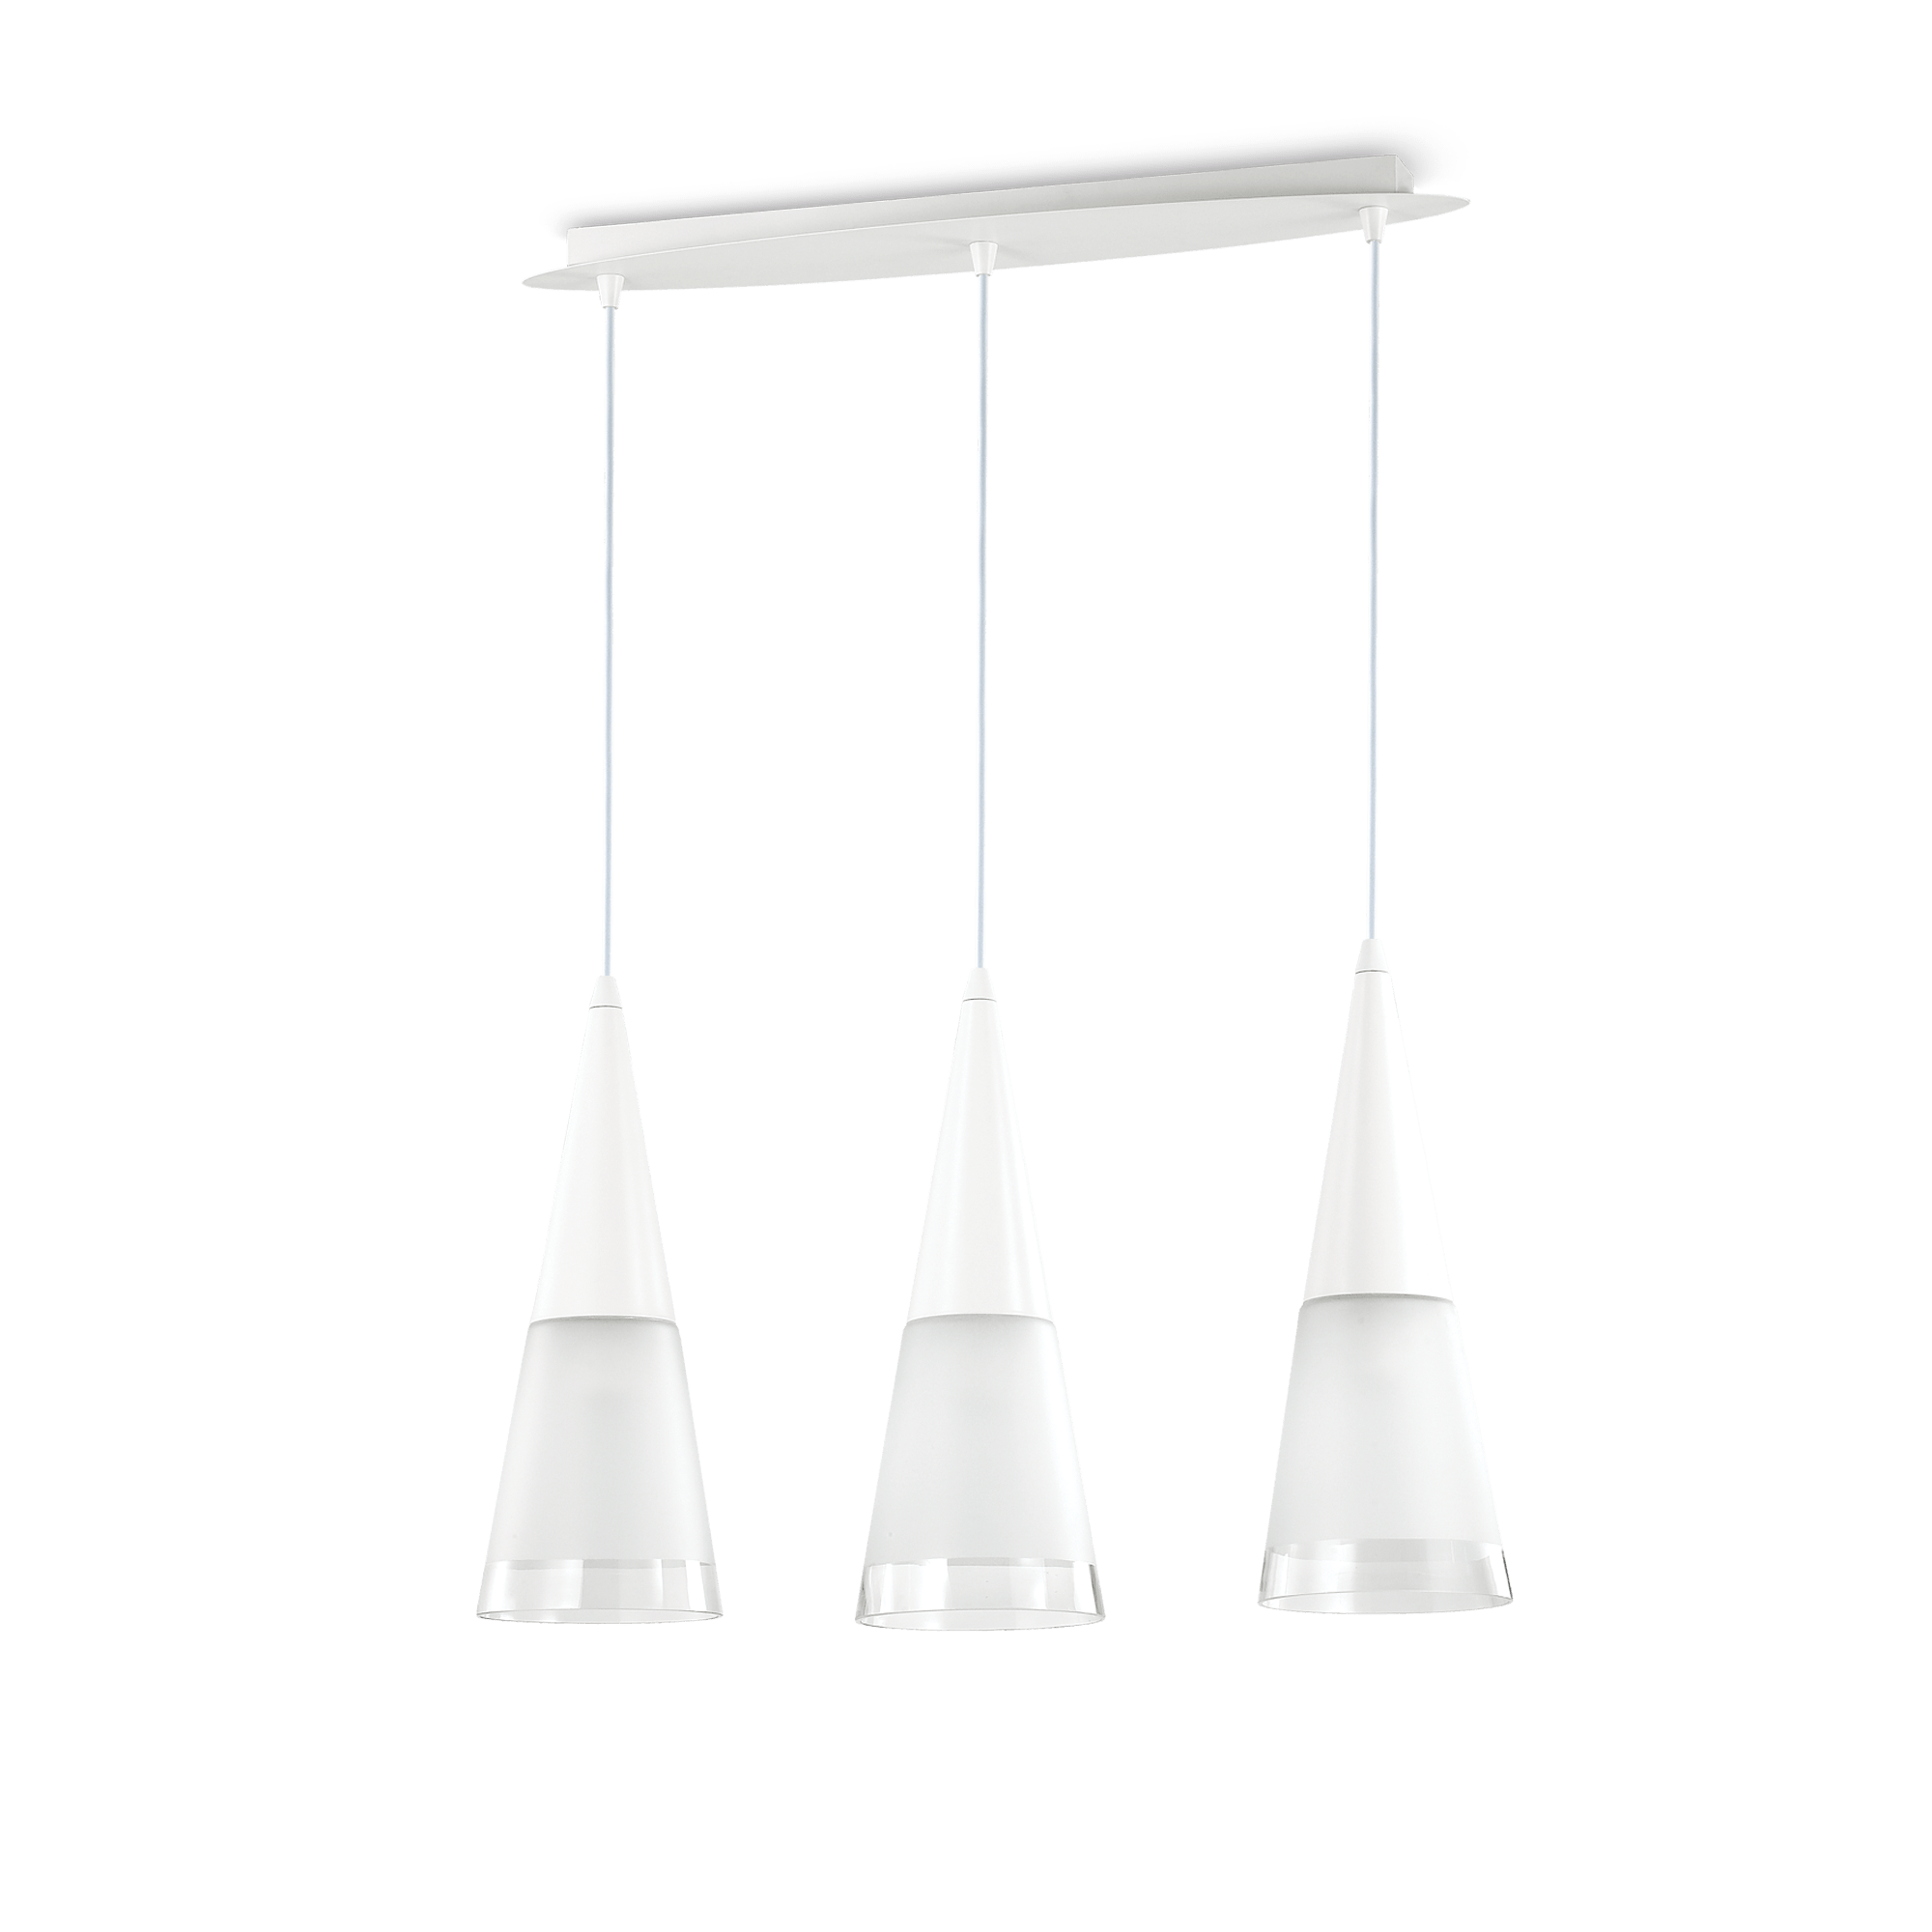 Ideal Lux 112381 Cono SP3 Bianco lámpa függeszték